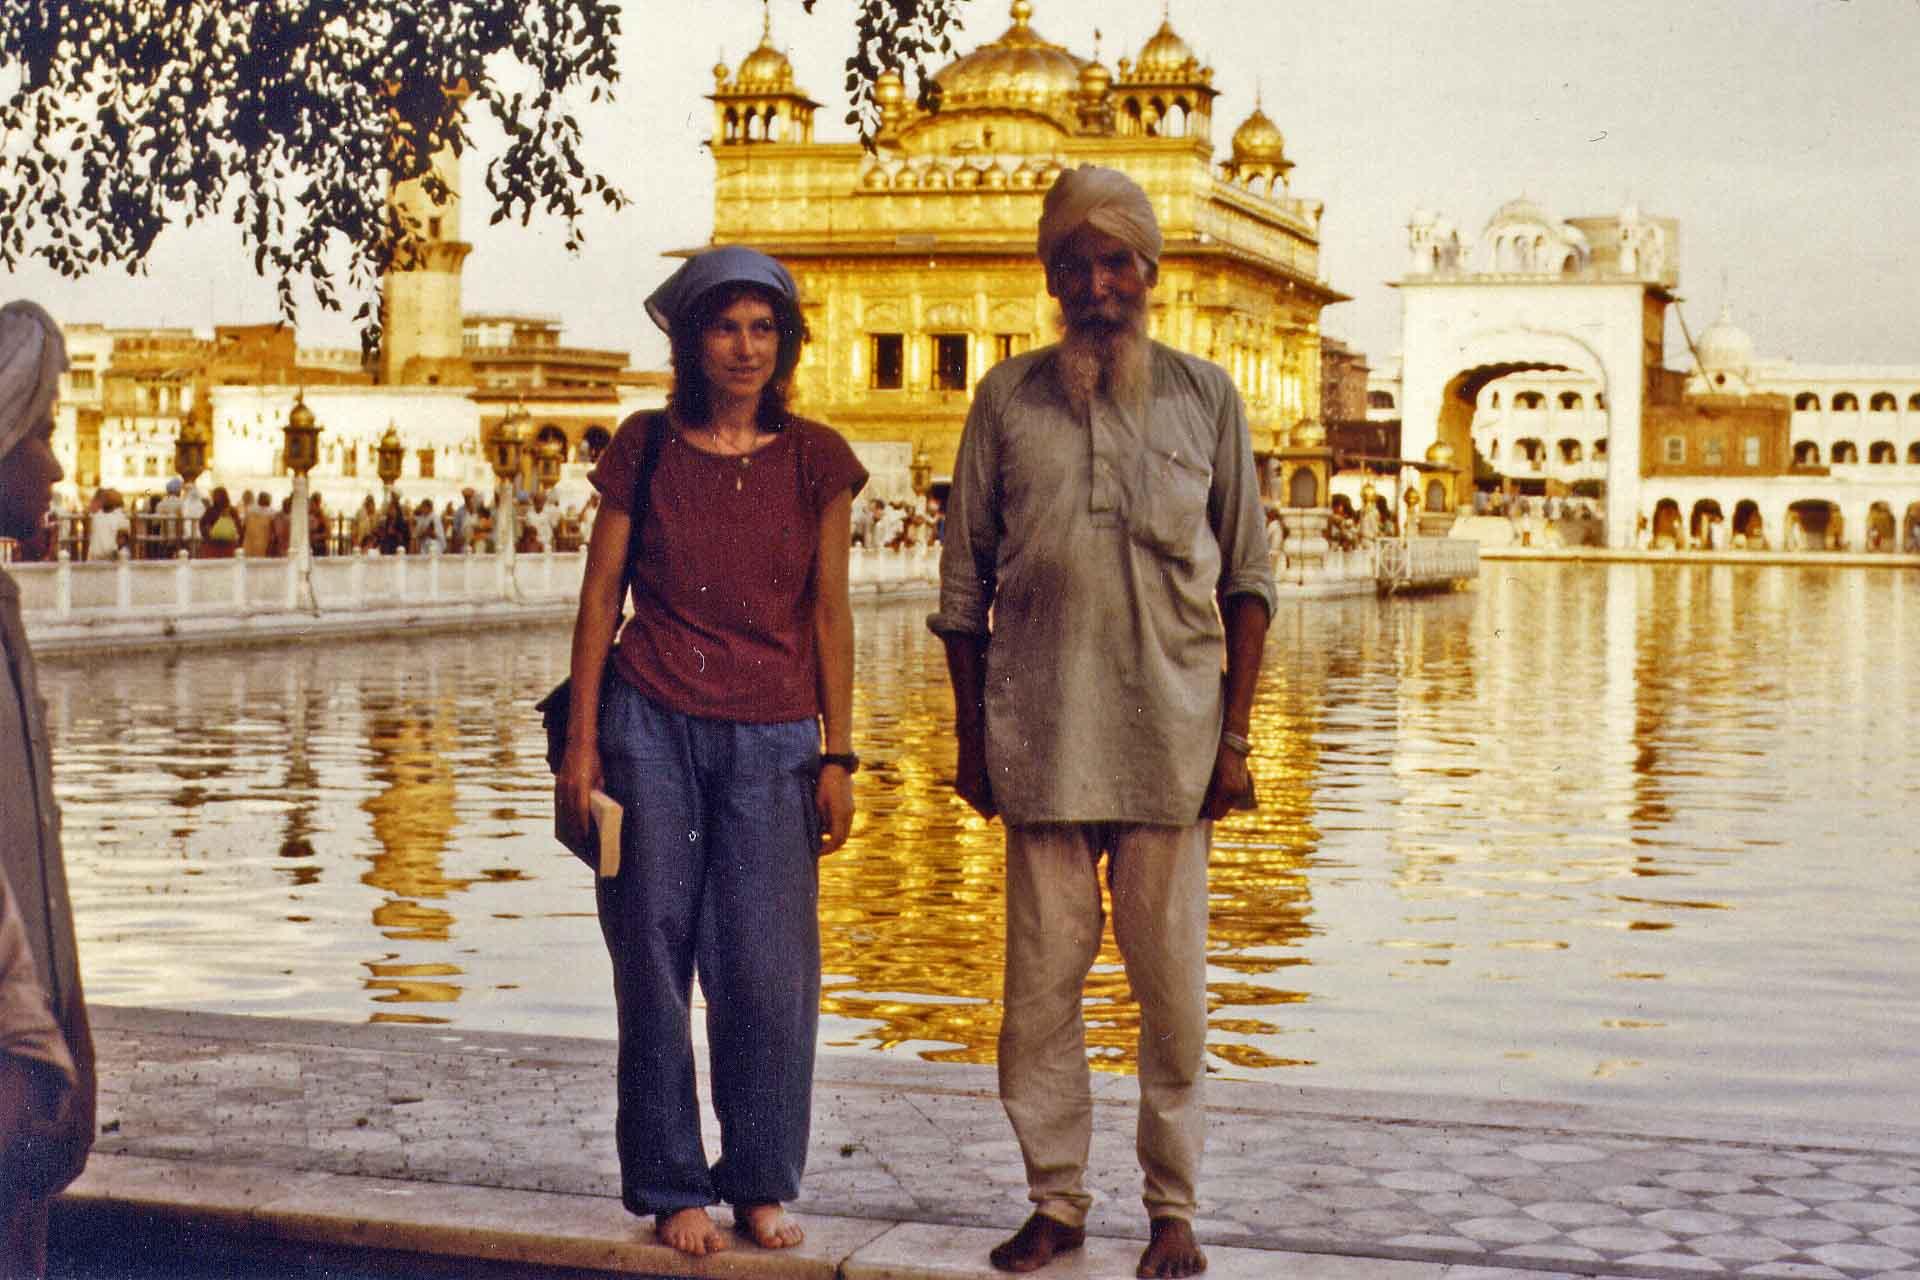 Amritsar Golden Temple 1983